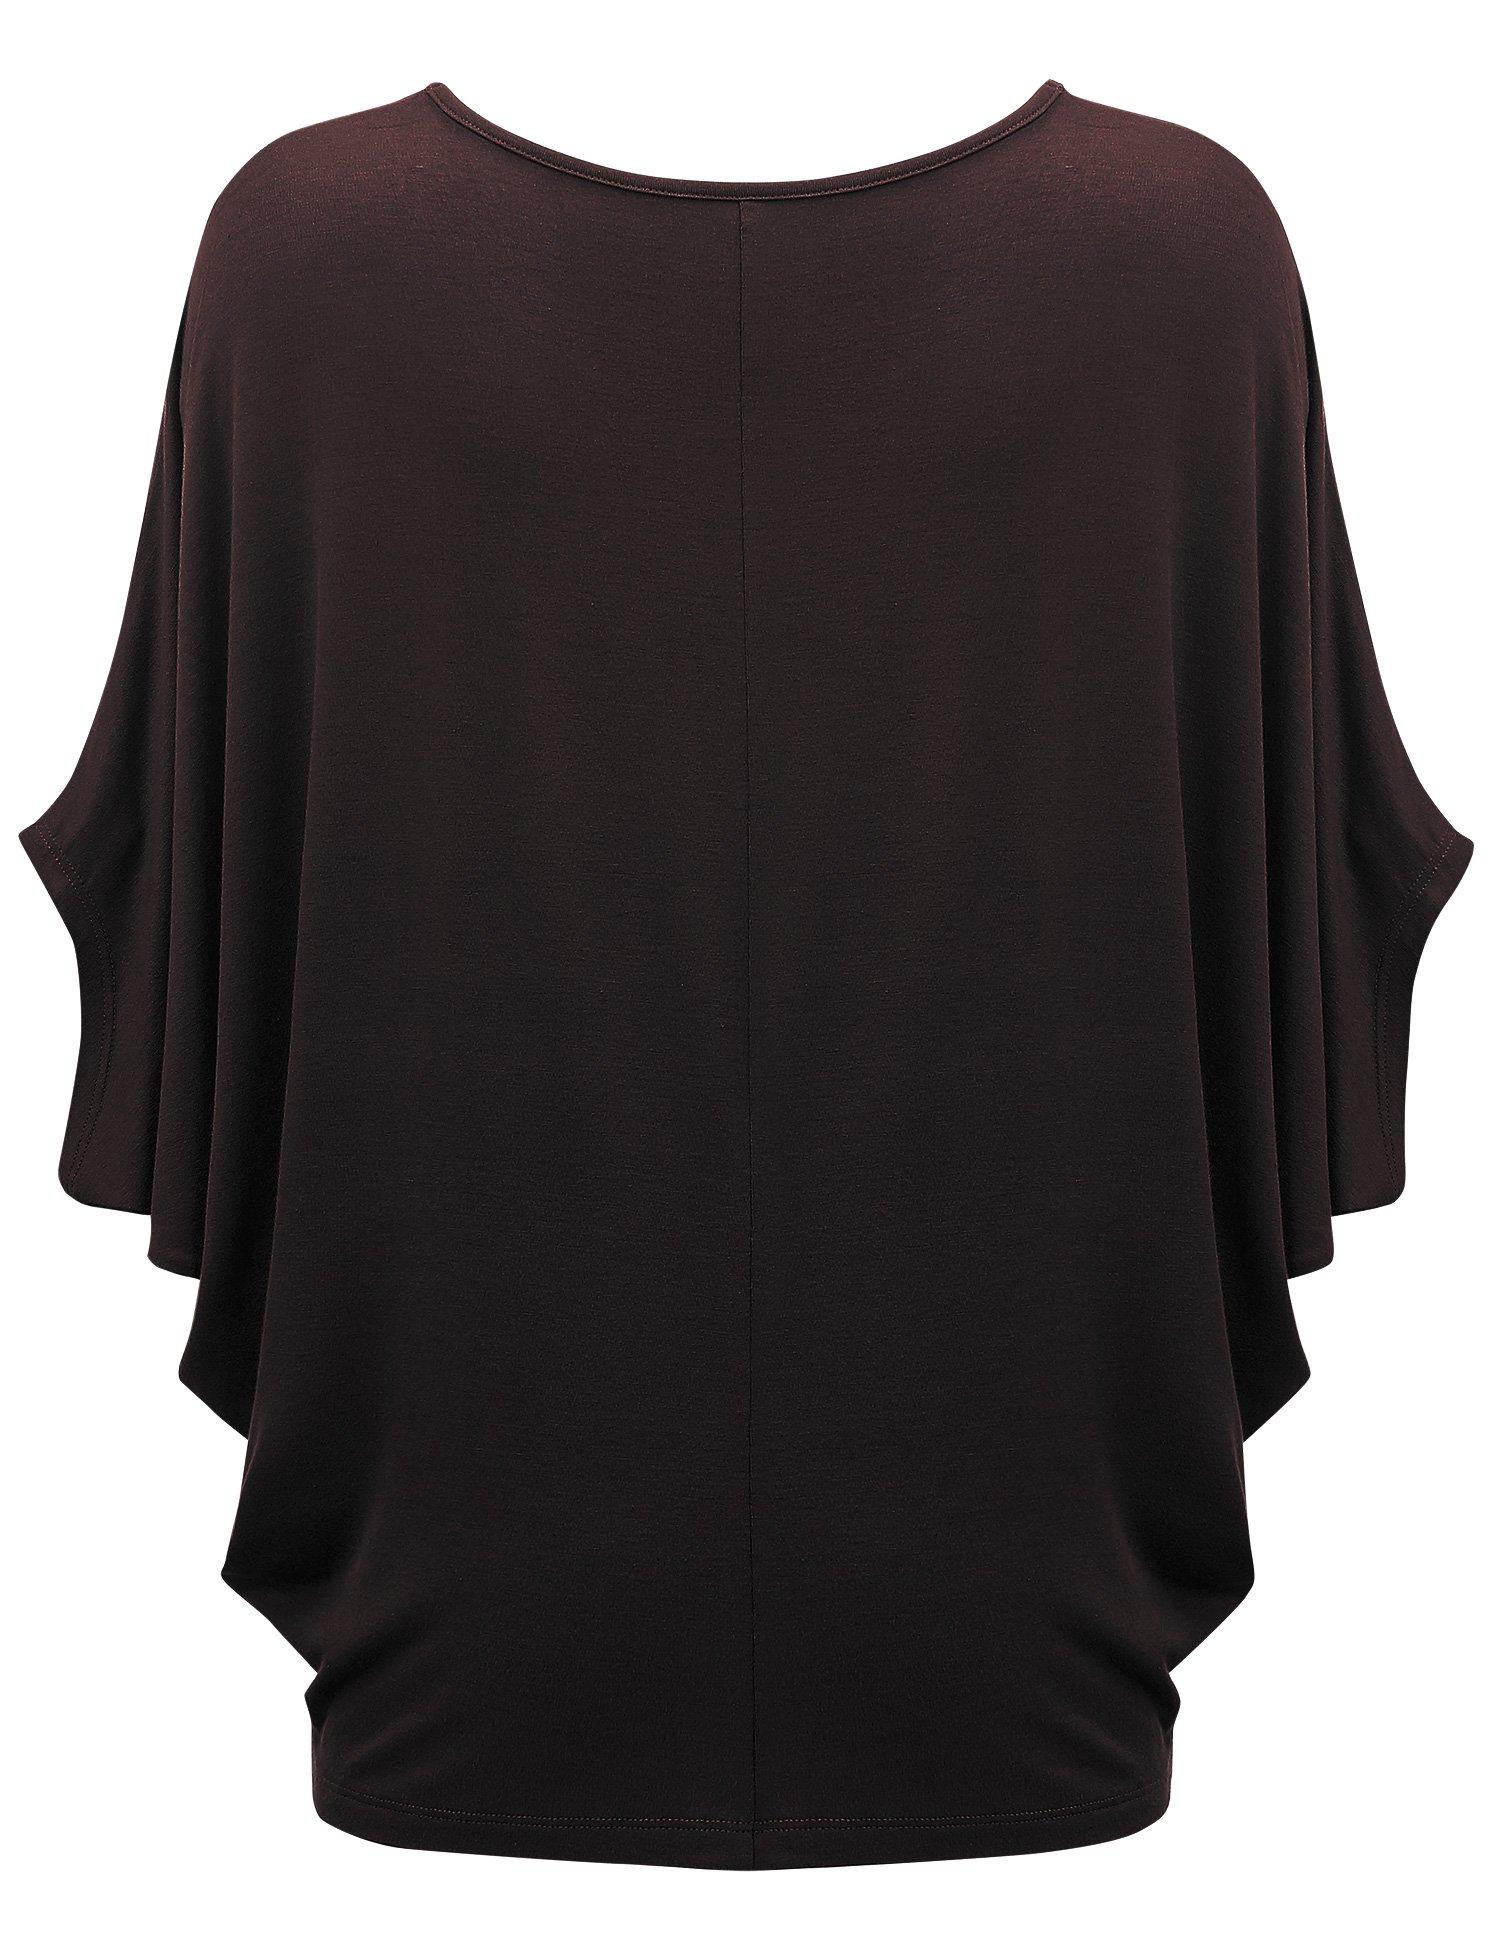 WT1073 Womens Scoop Neck Half Sleeve Batwing Dolman Top S BROWN by Lock and Love (Image #2)